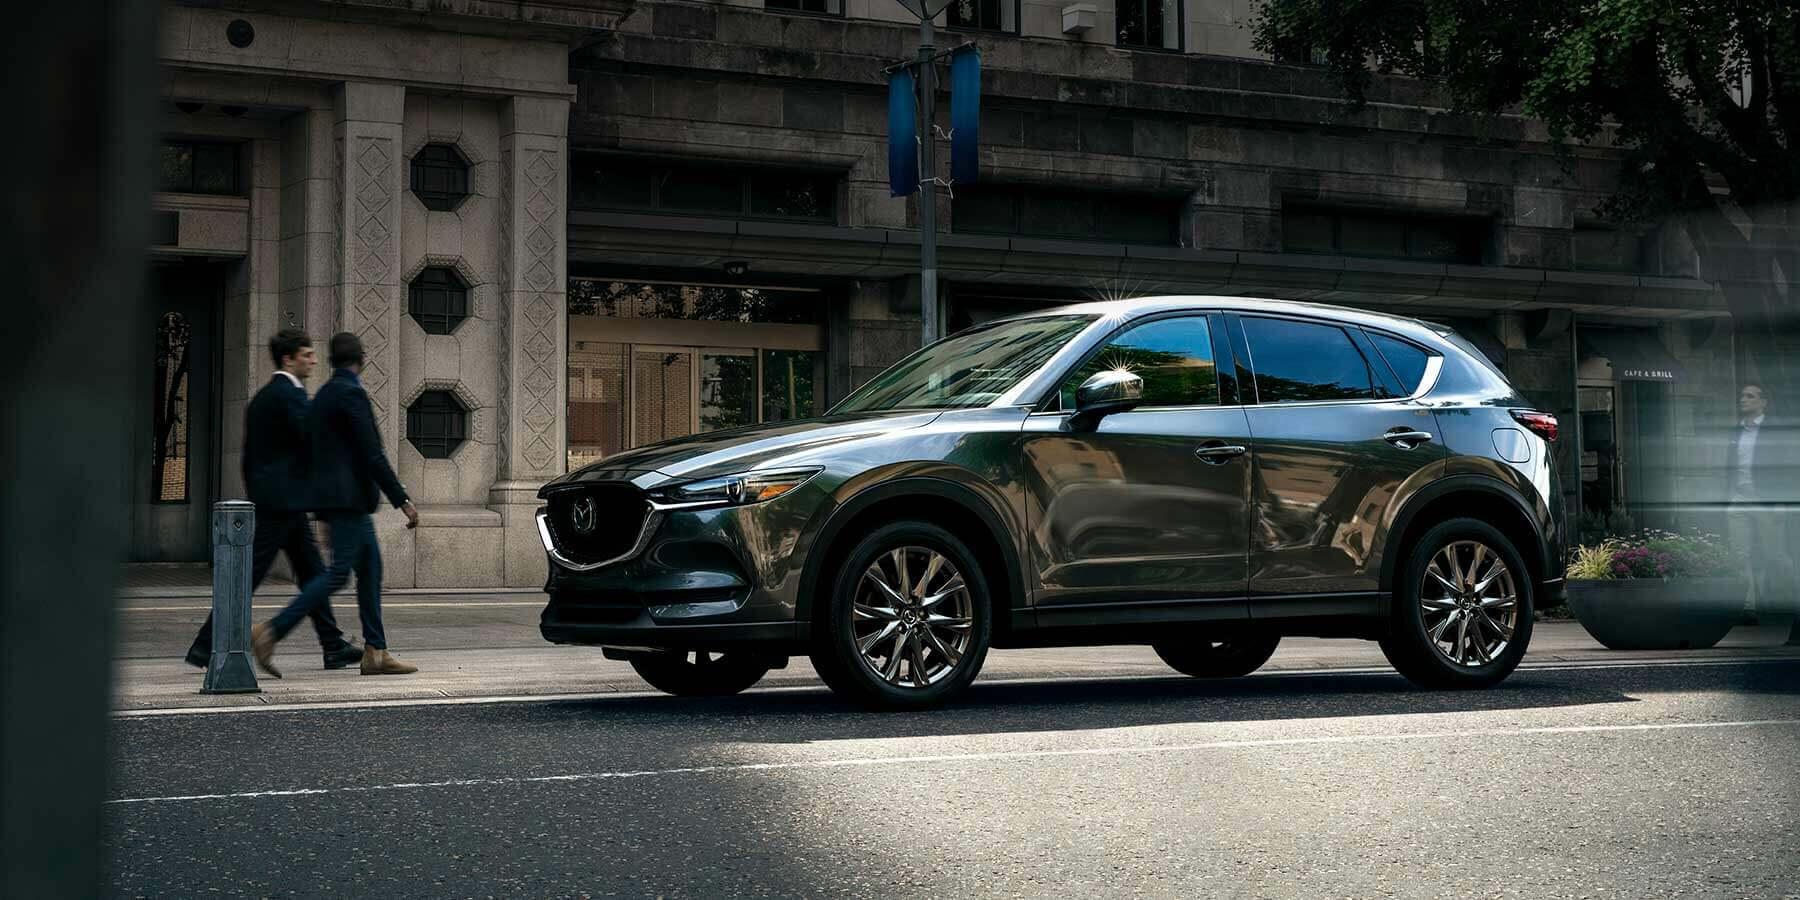 New Mazda CX-5 GTX 2.5L TURBO PLUS CA